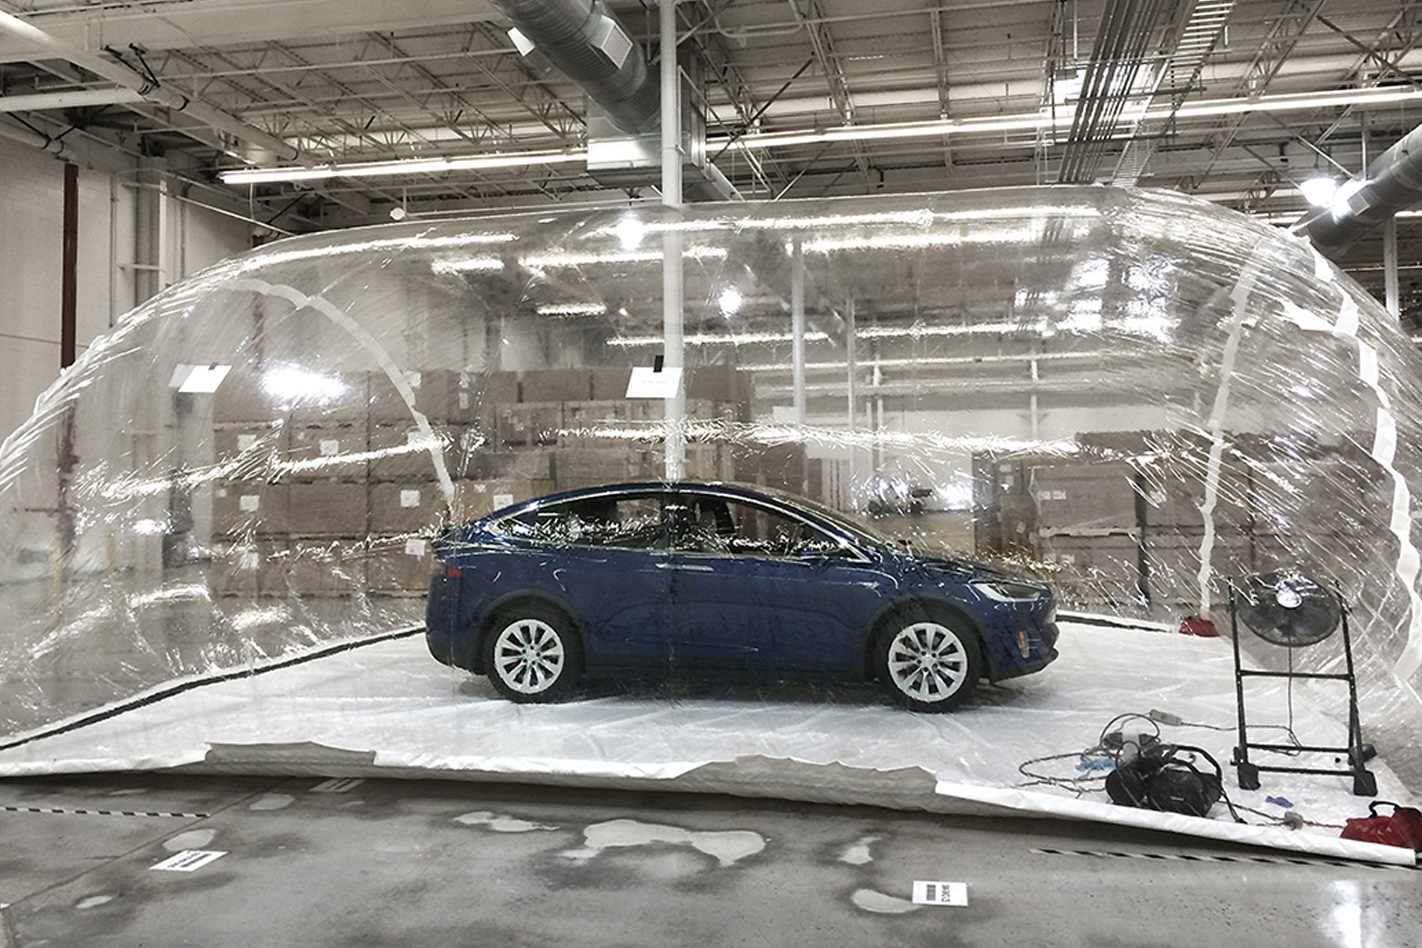 Tesla Bioweapon Defence testing